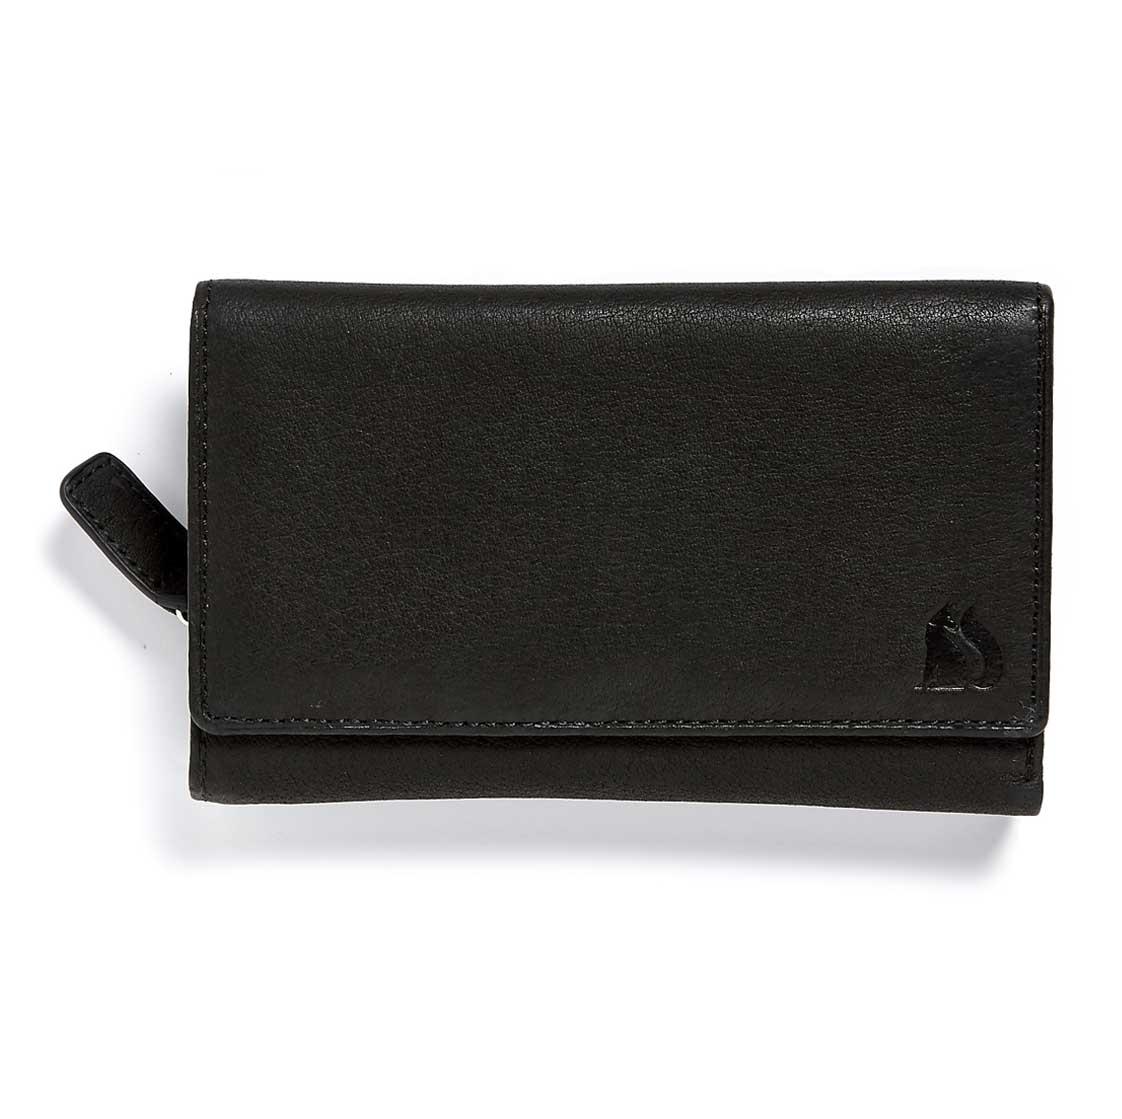 Foxfield Thirlmere Black Leather Purse